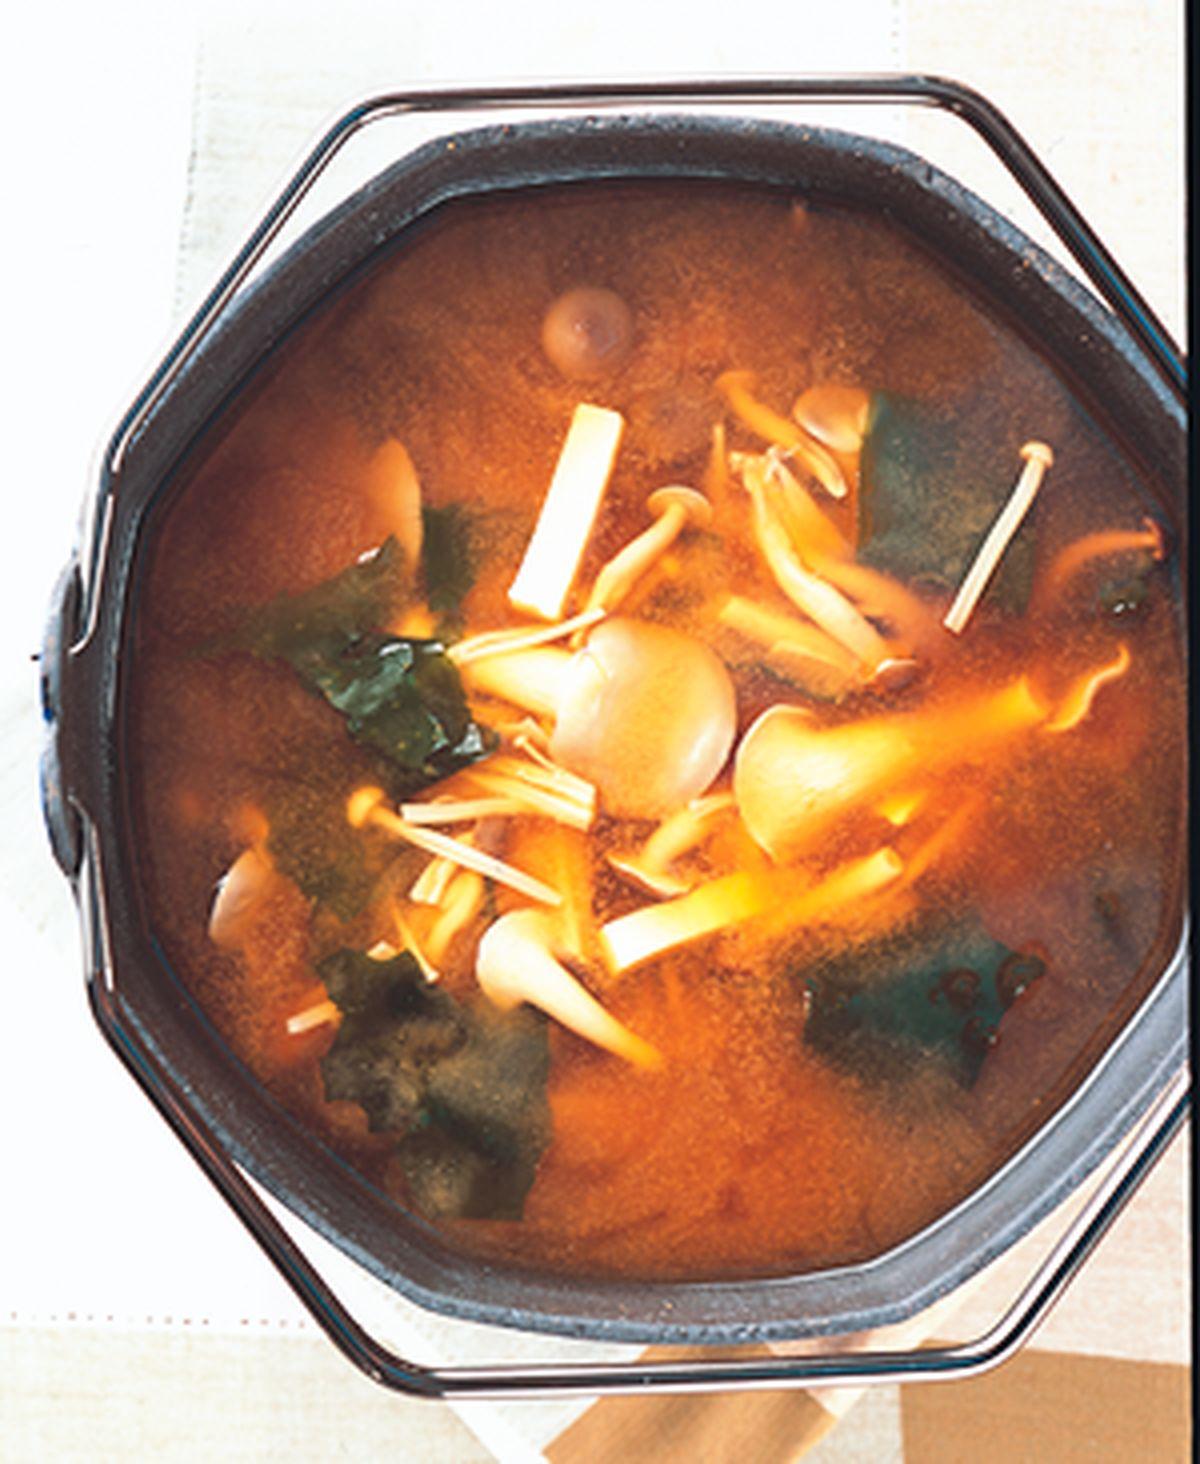 【食譜】蕈菇味噌湯:www.ytower.com.tw